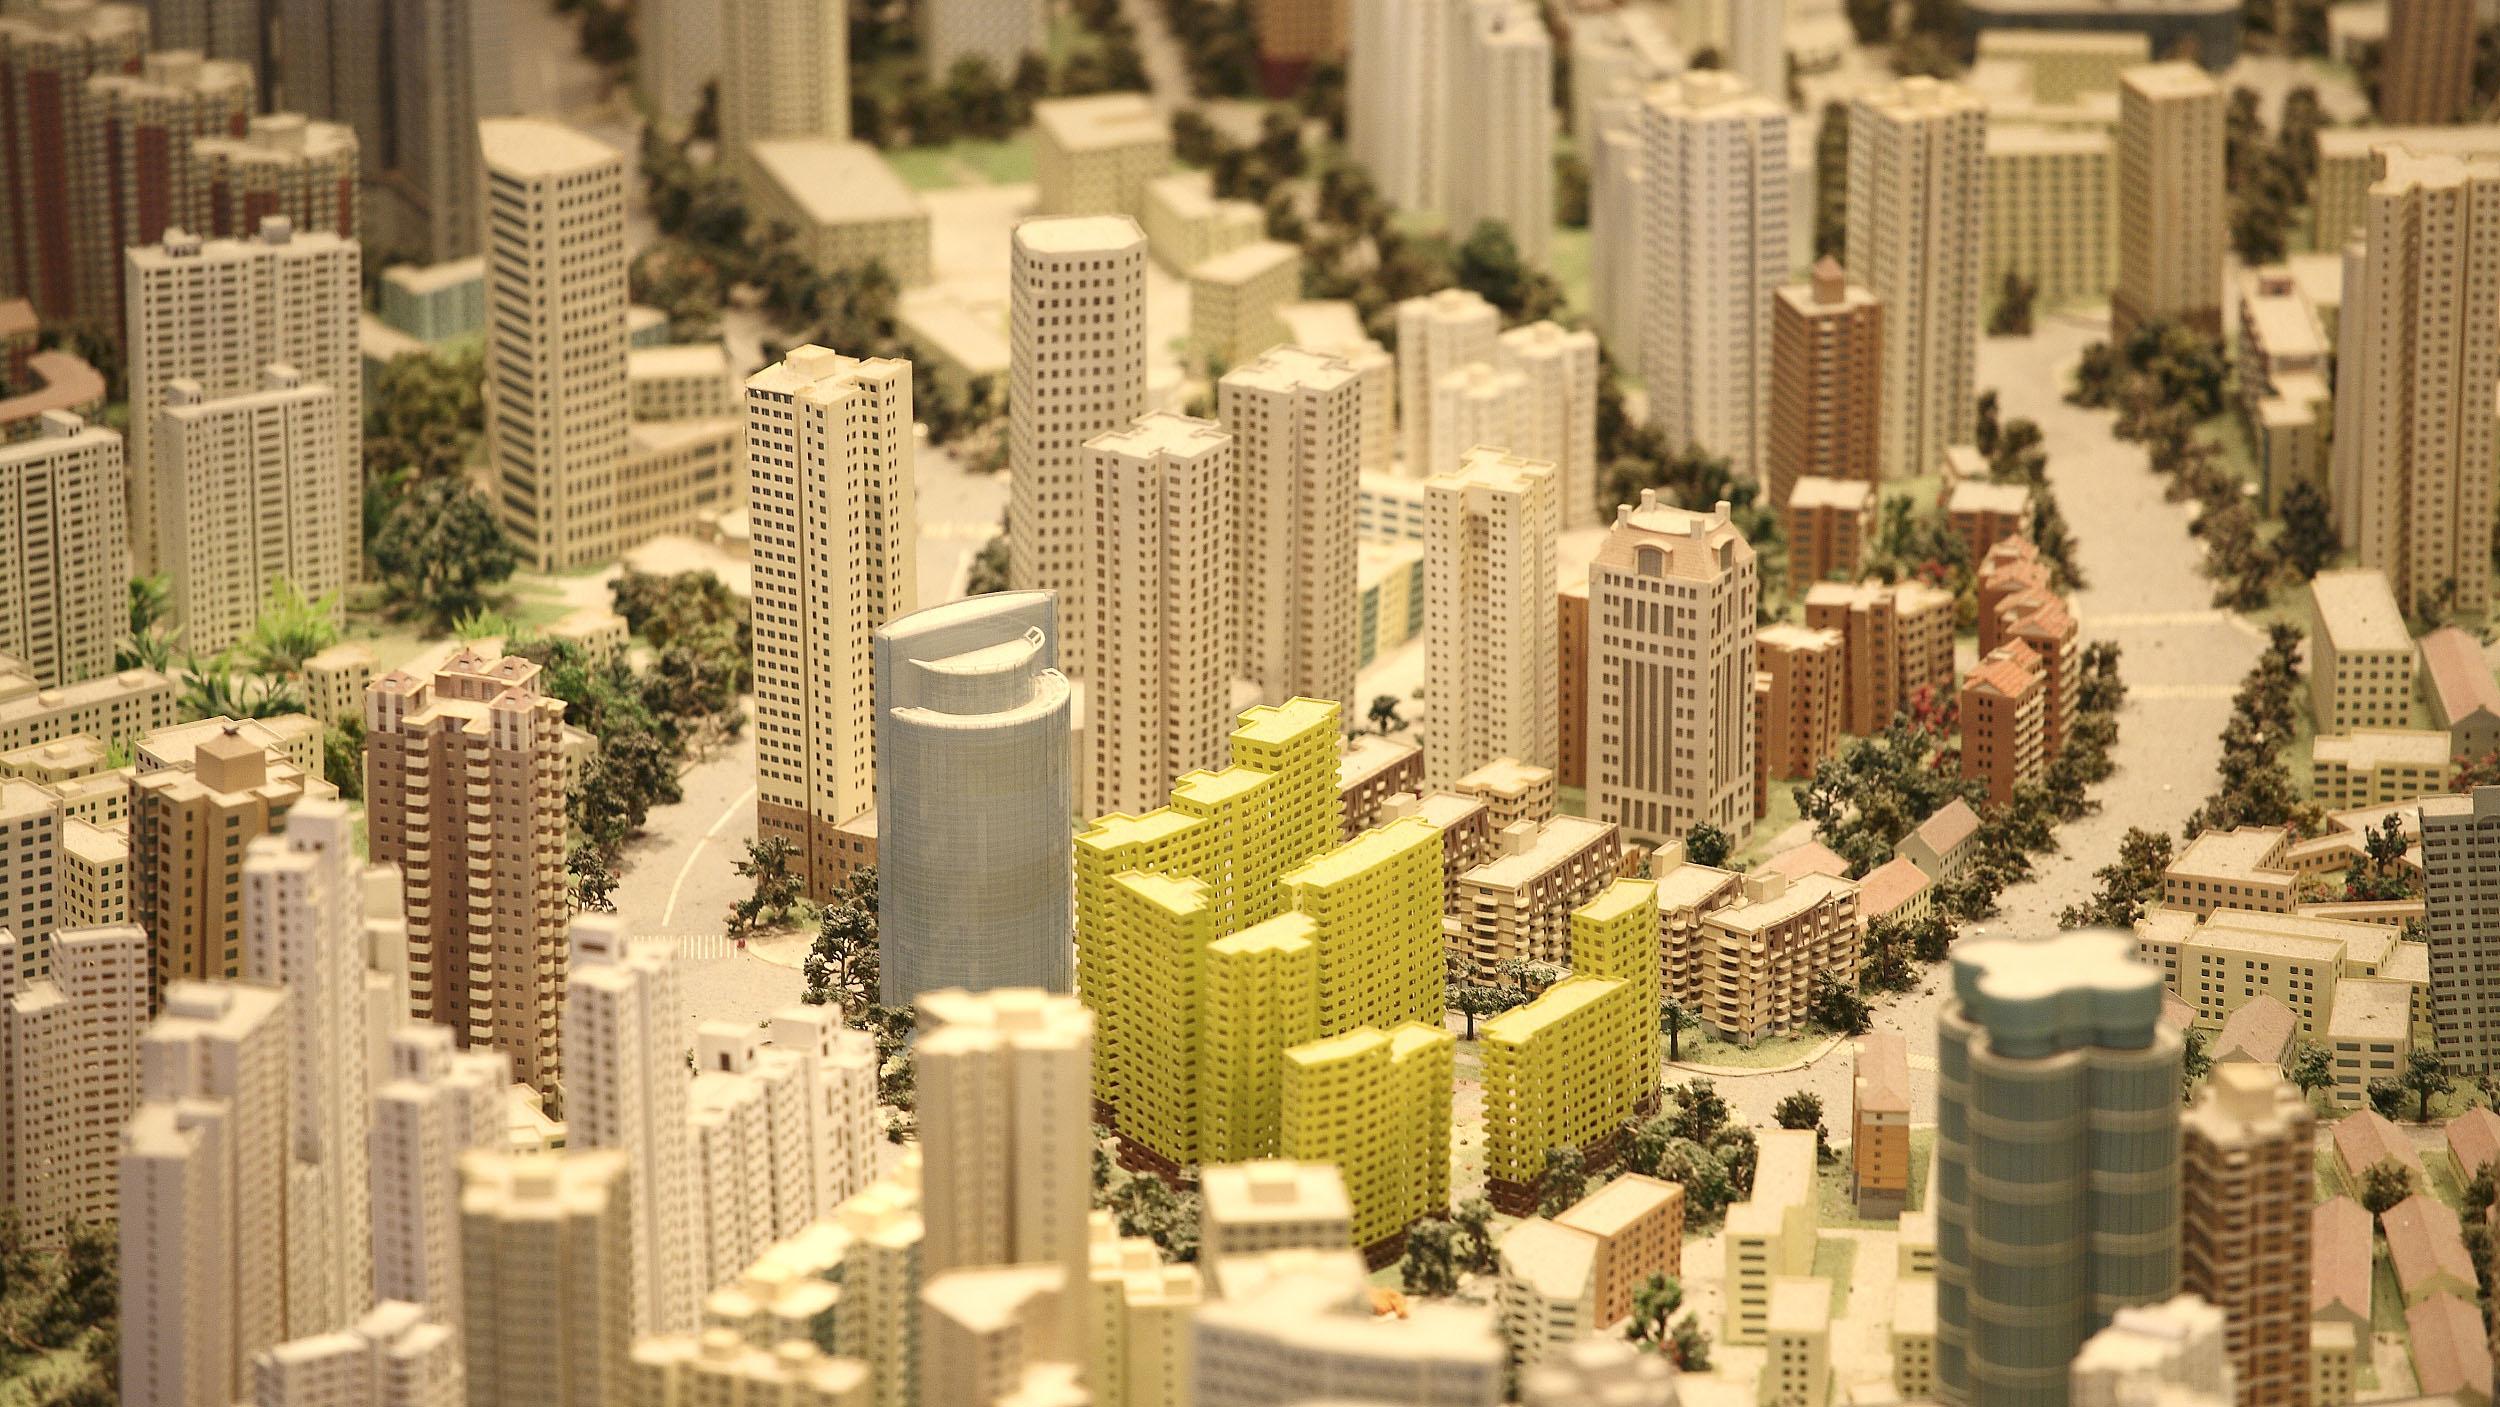 China luxury housing market registered a V-shape rebound in Q2